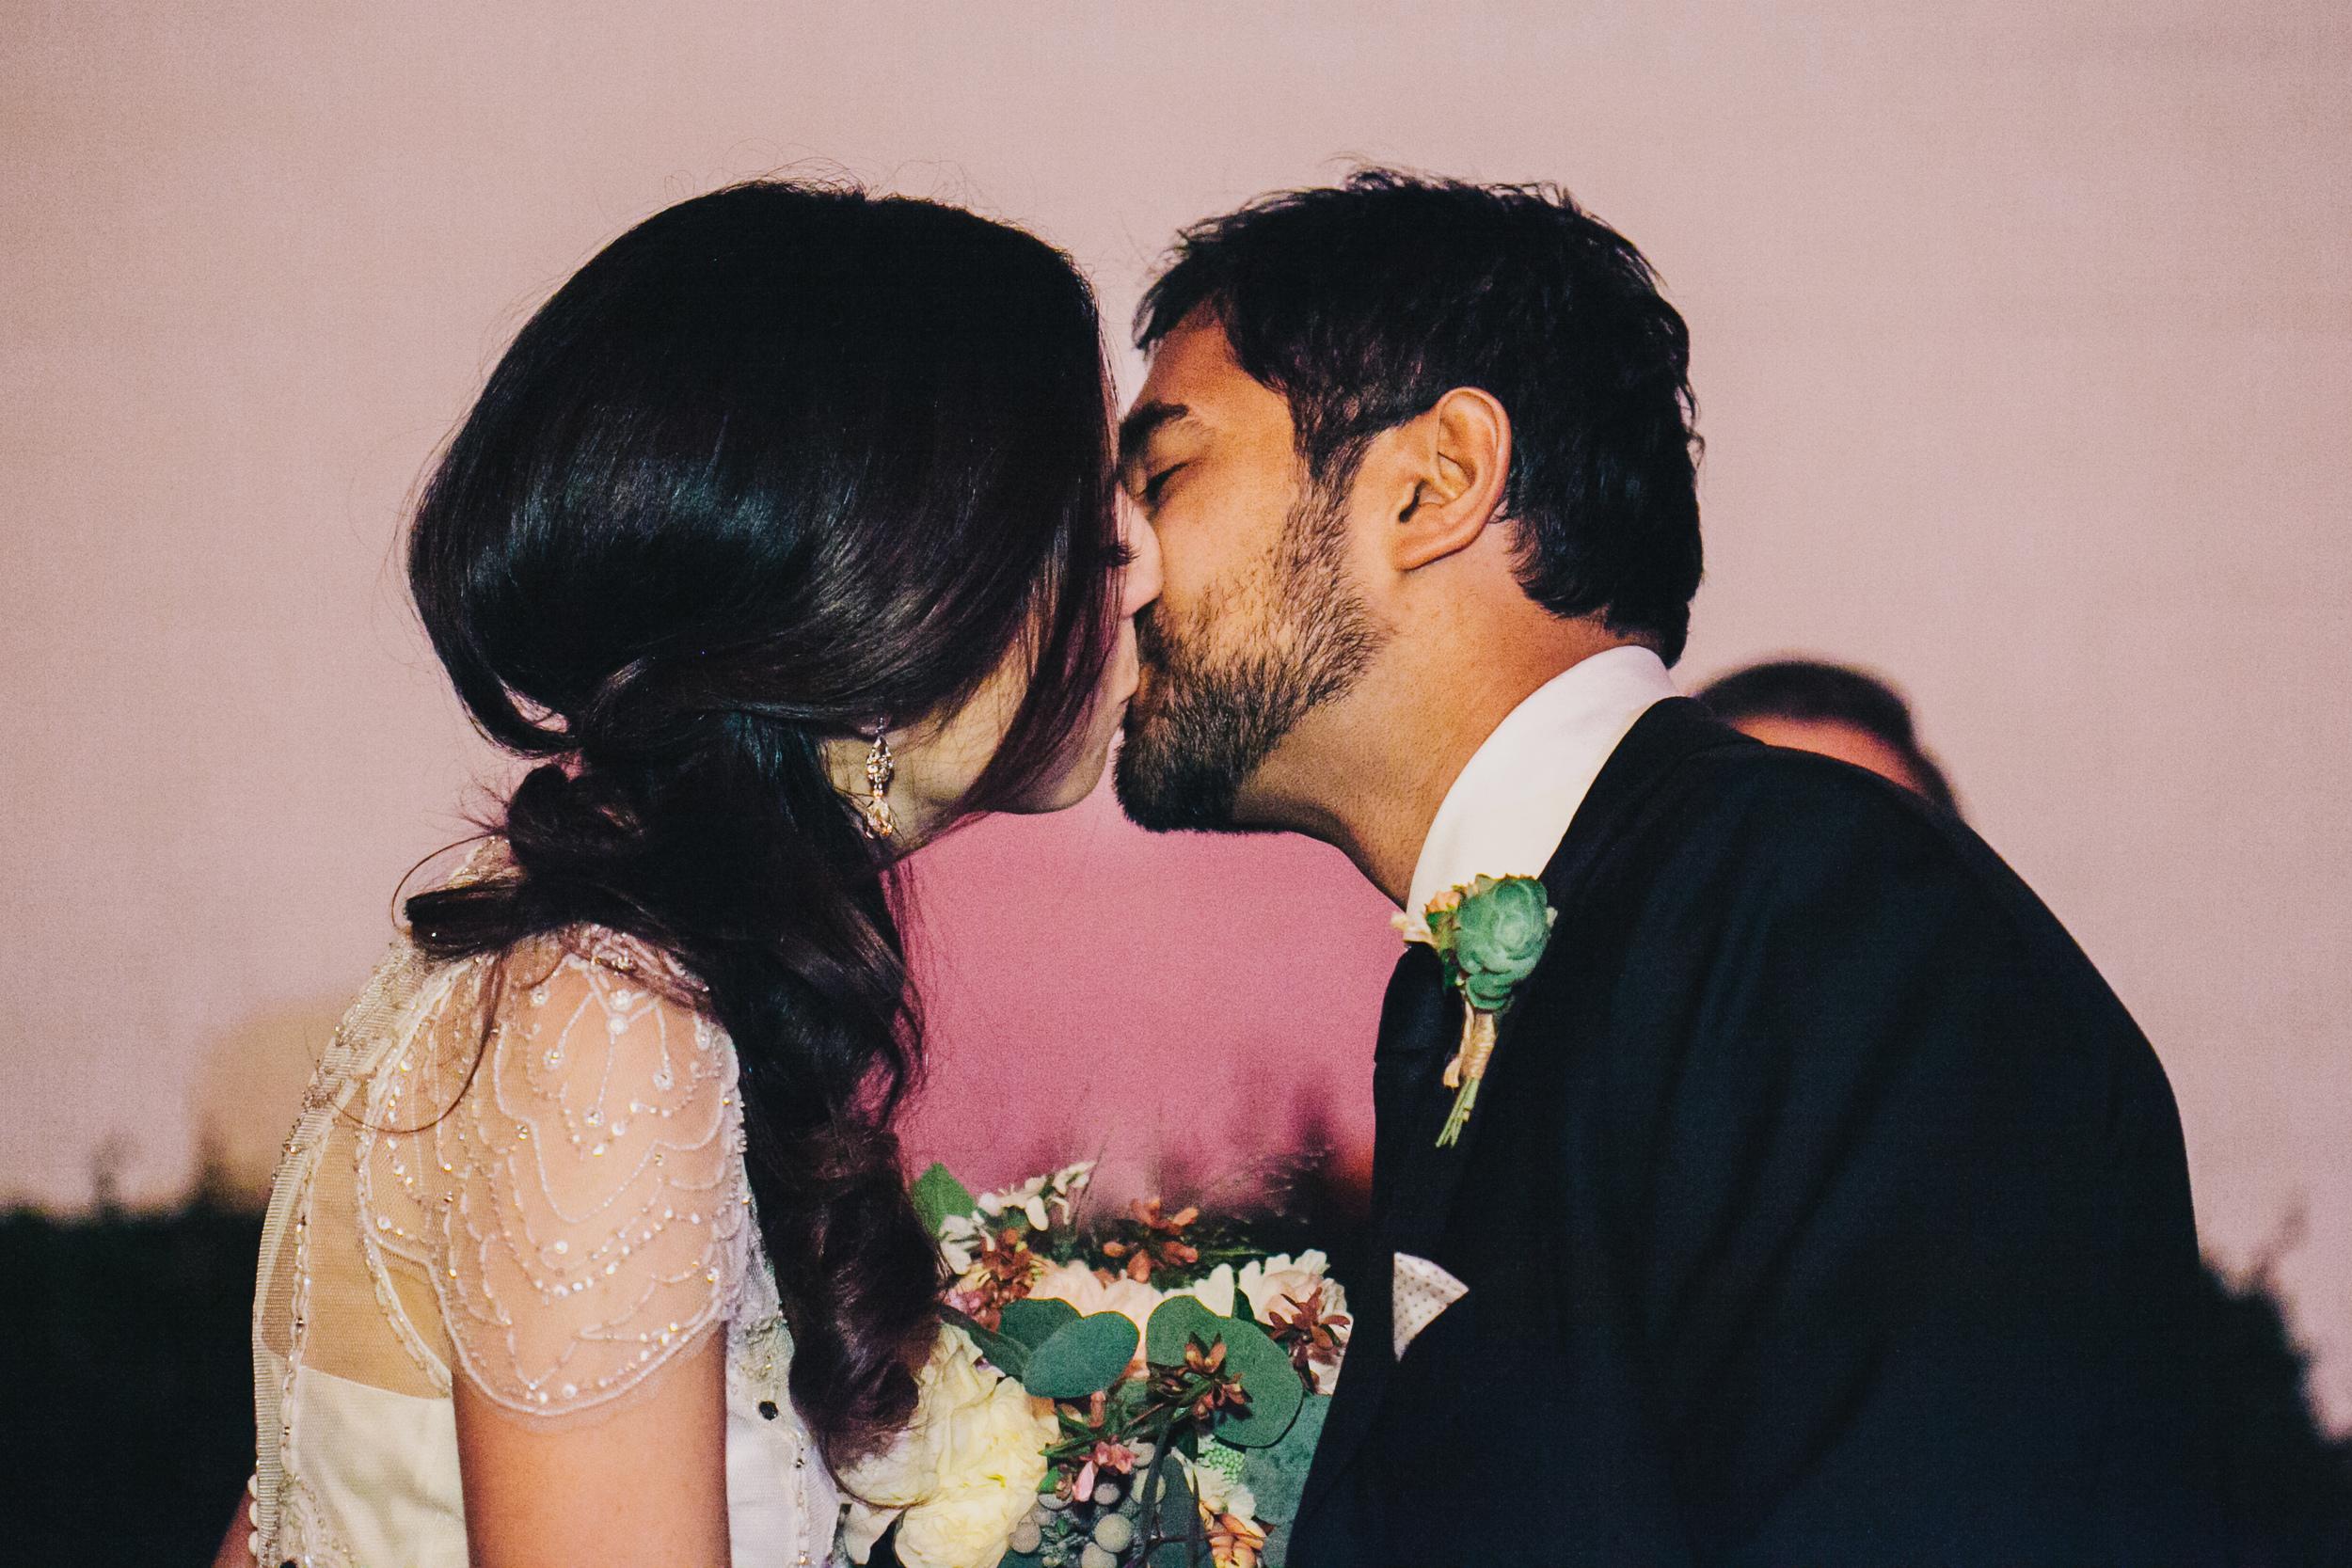 Foreign_Cinema_Wedding_Photography-22.JPG